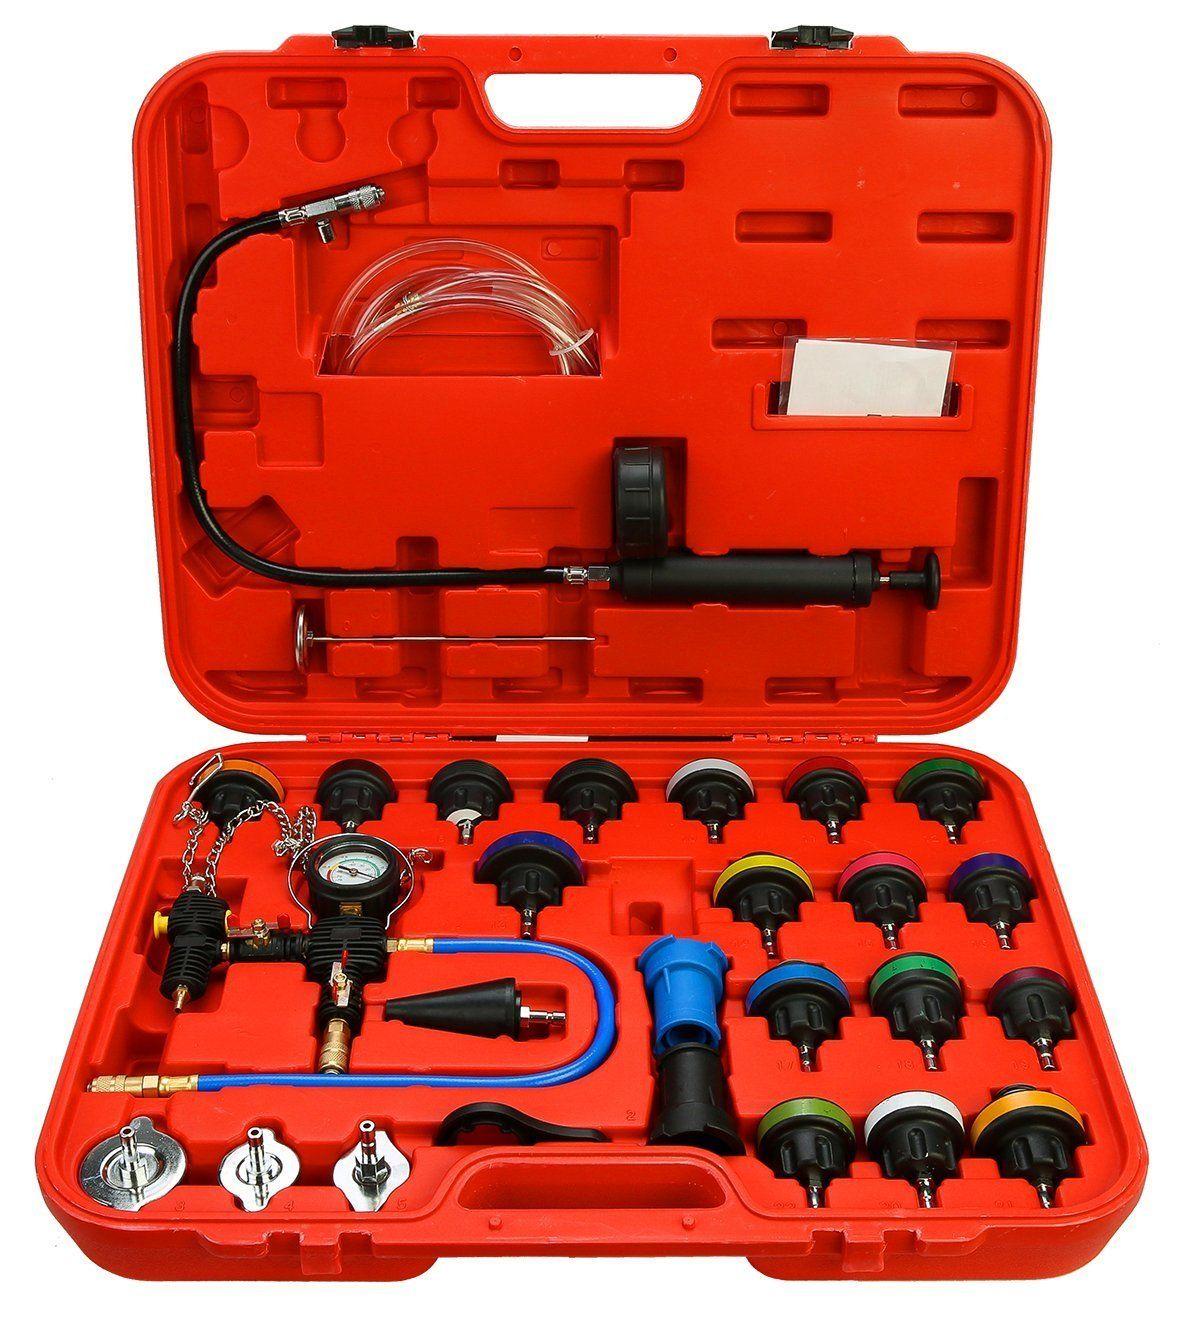 Radiator Cup Tester Kit 27pc Cooling System Kit MYRPT10